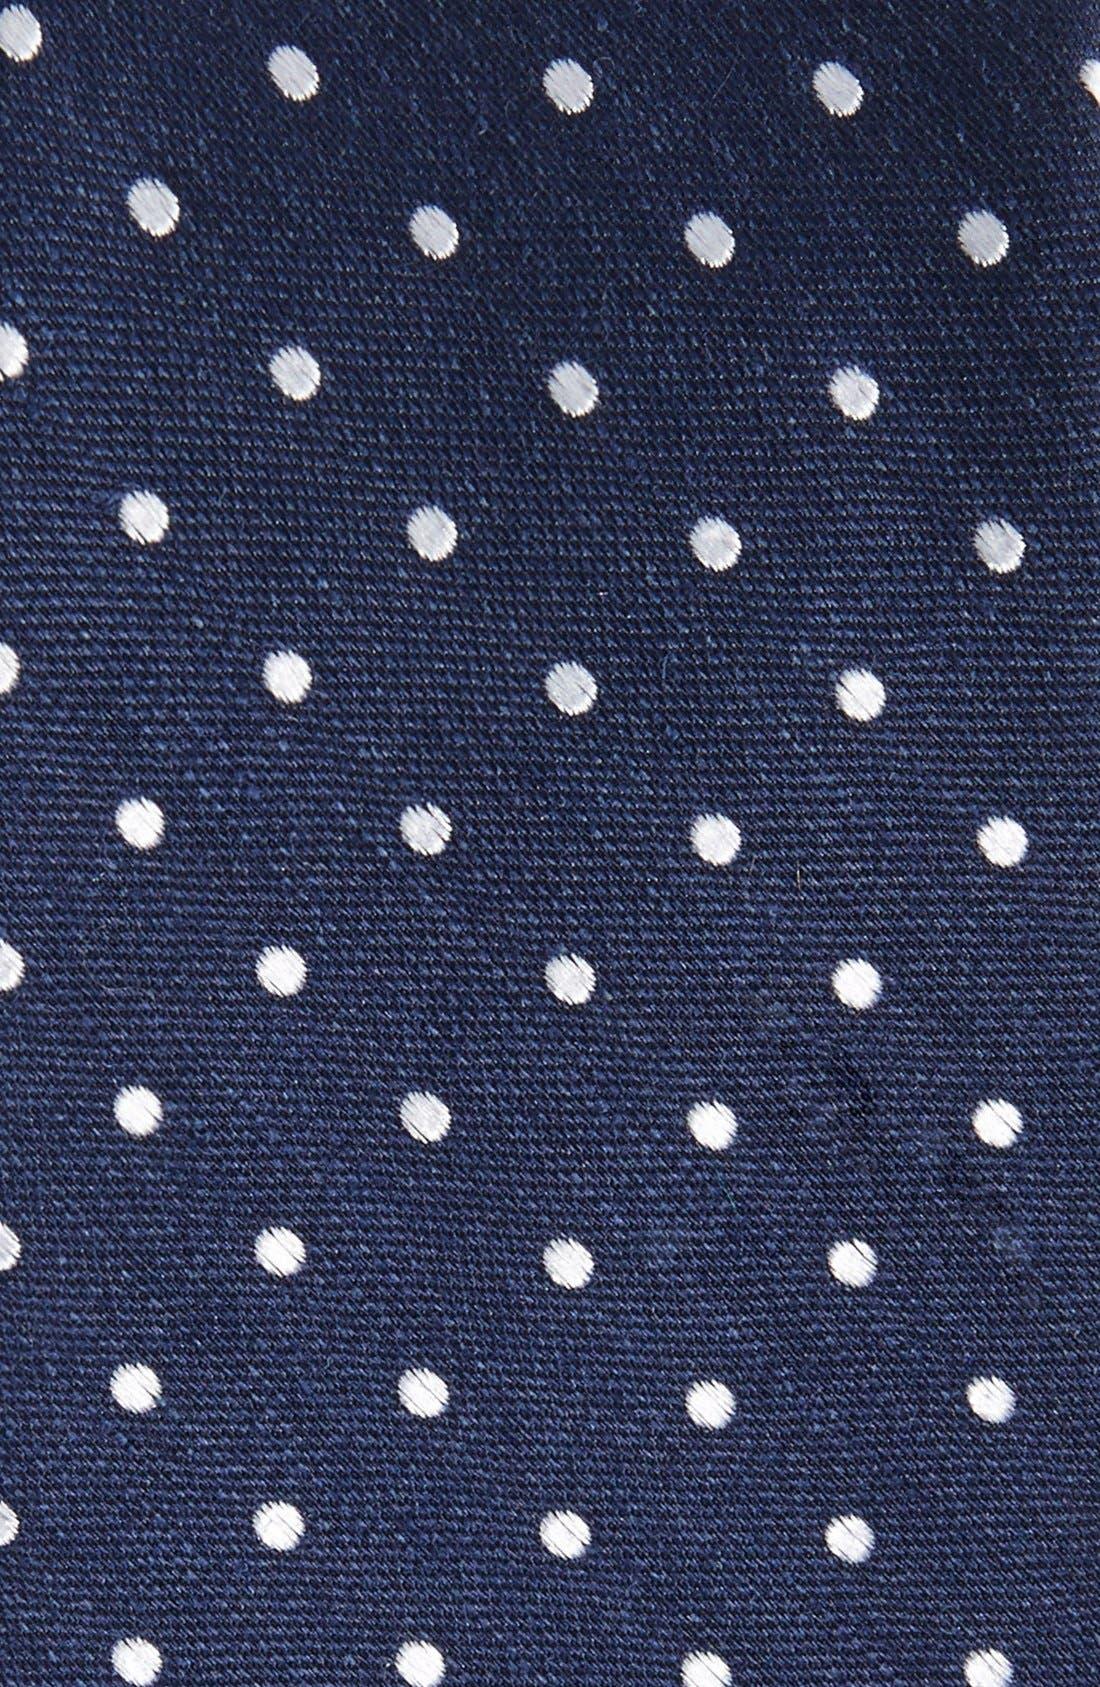 Dot Silk & Linen Tie,                             Alternate thumbnail 2, color,                             NAVY